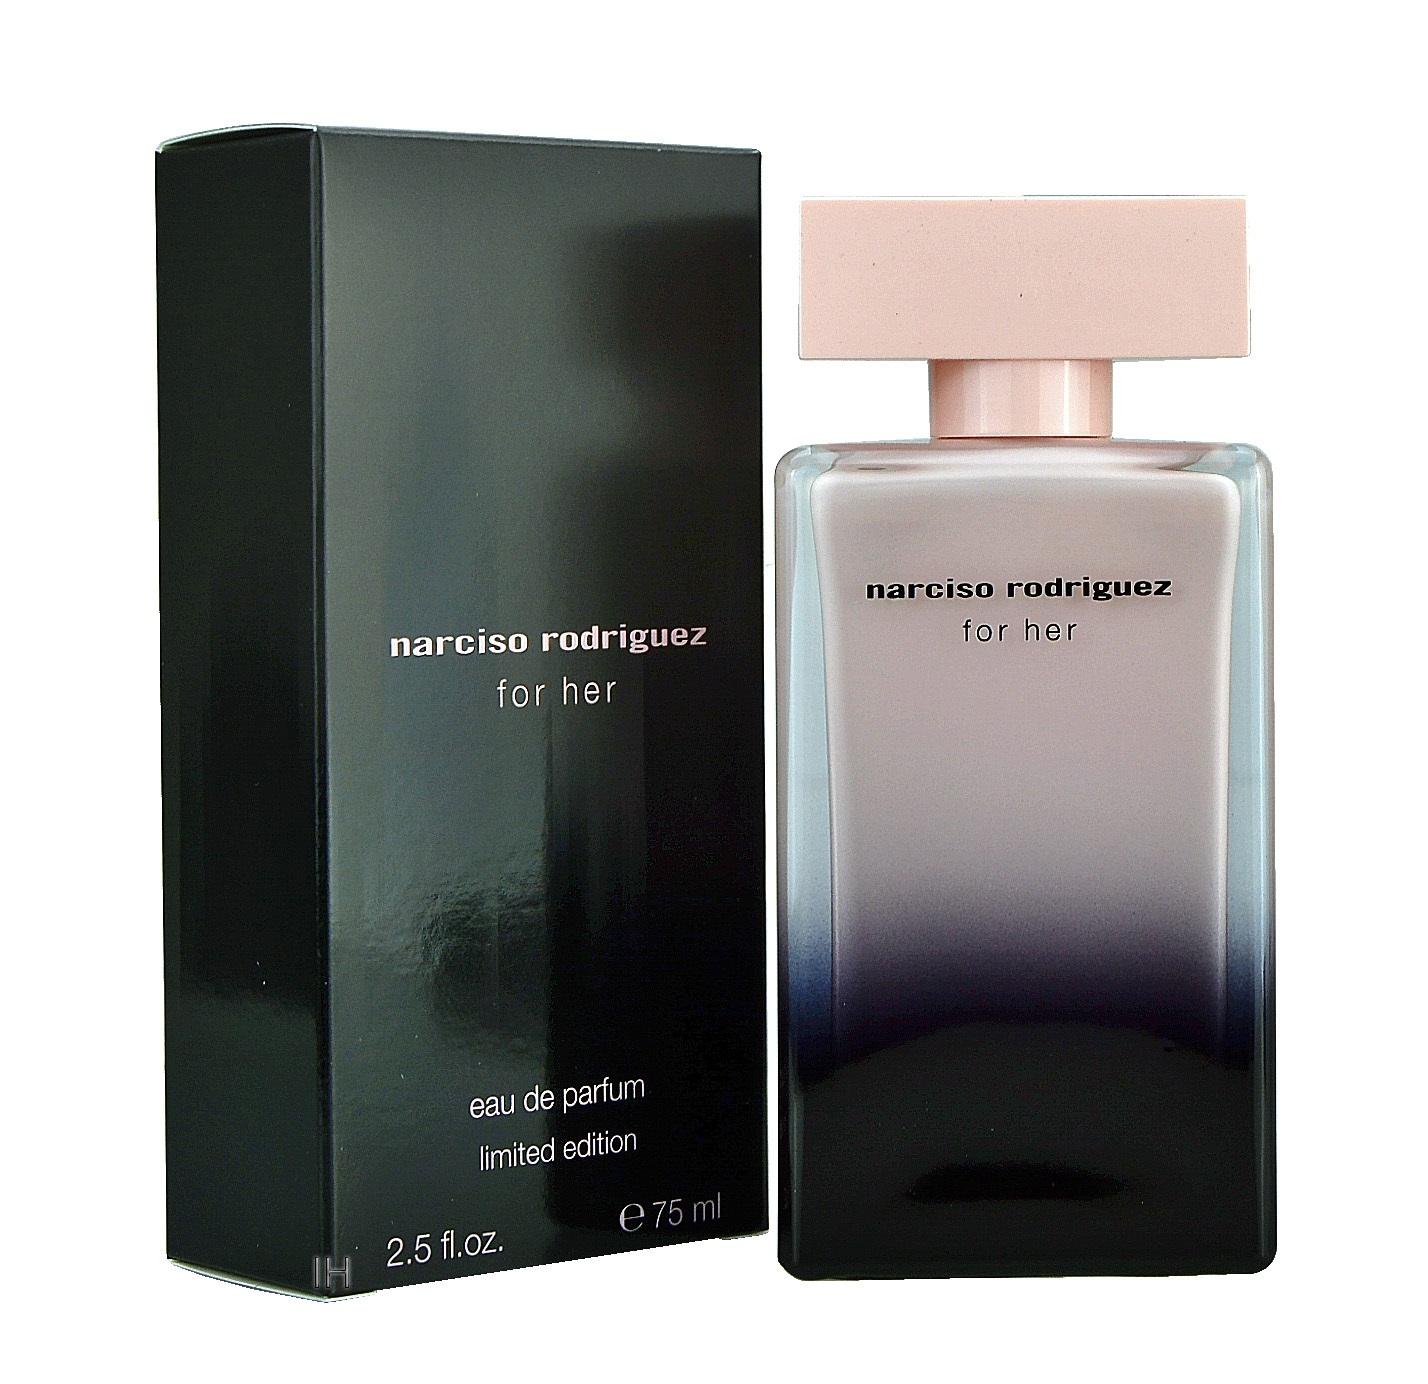 Narciso Rodriguez For Her Limited Edition Eau De Parfum 75 ml